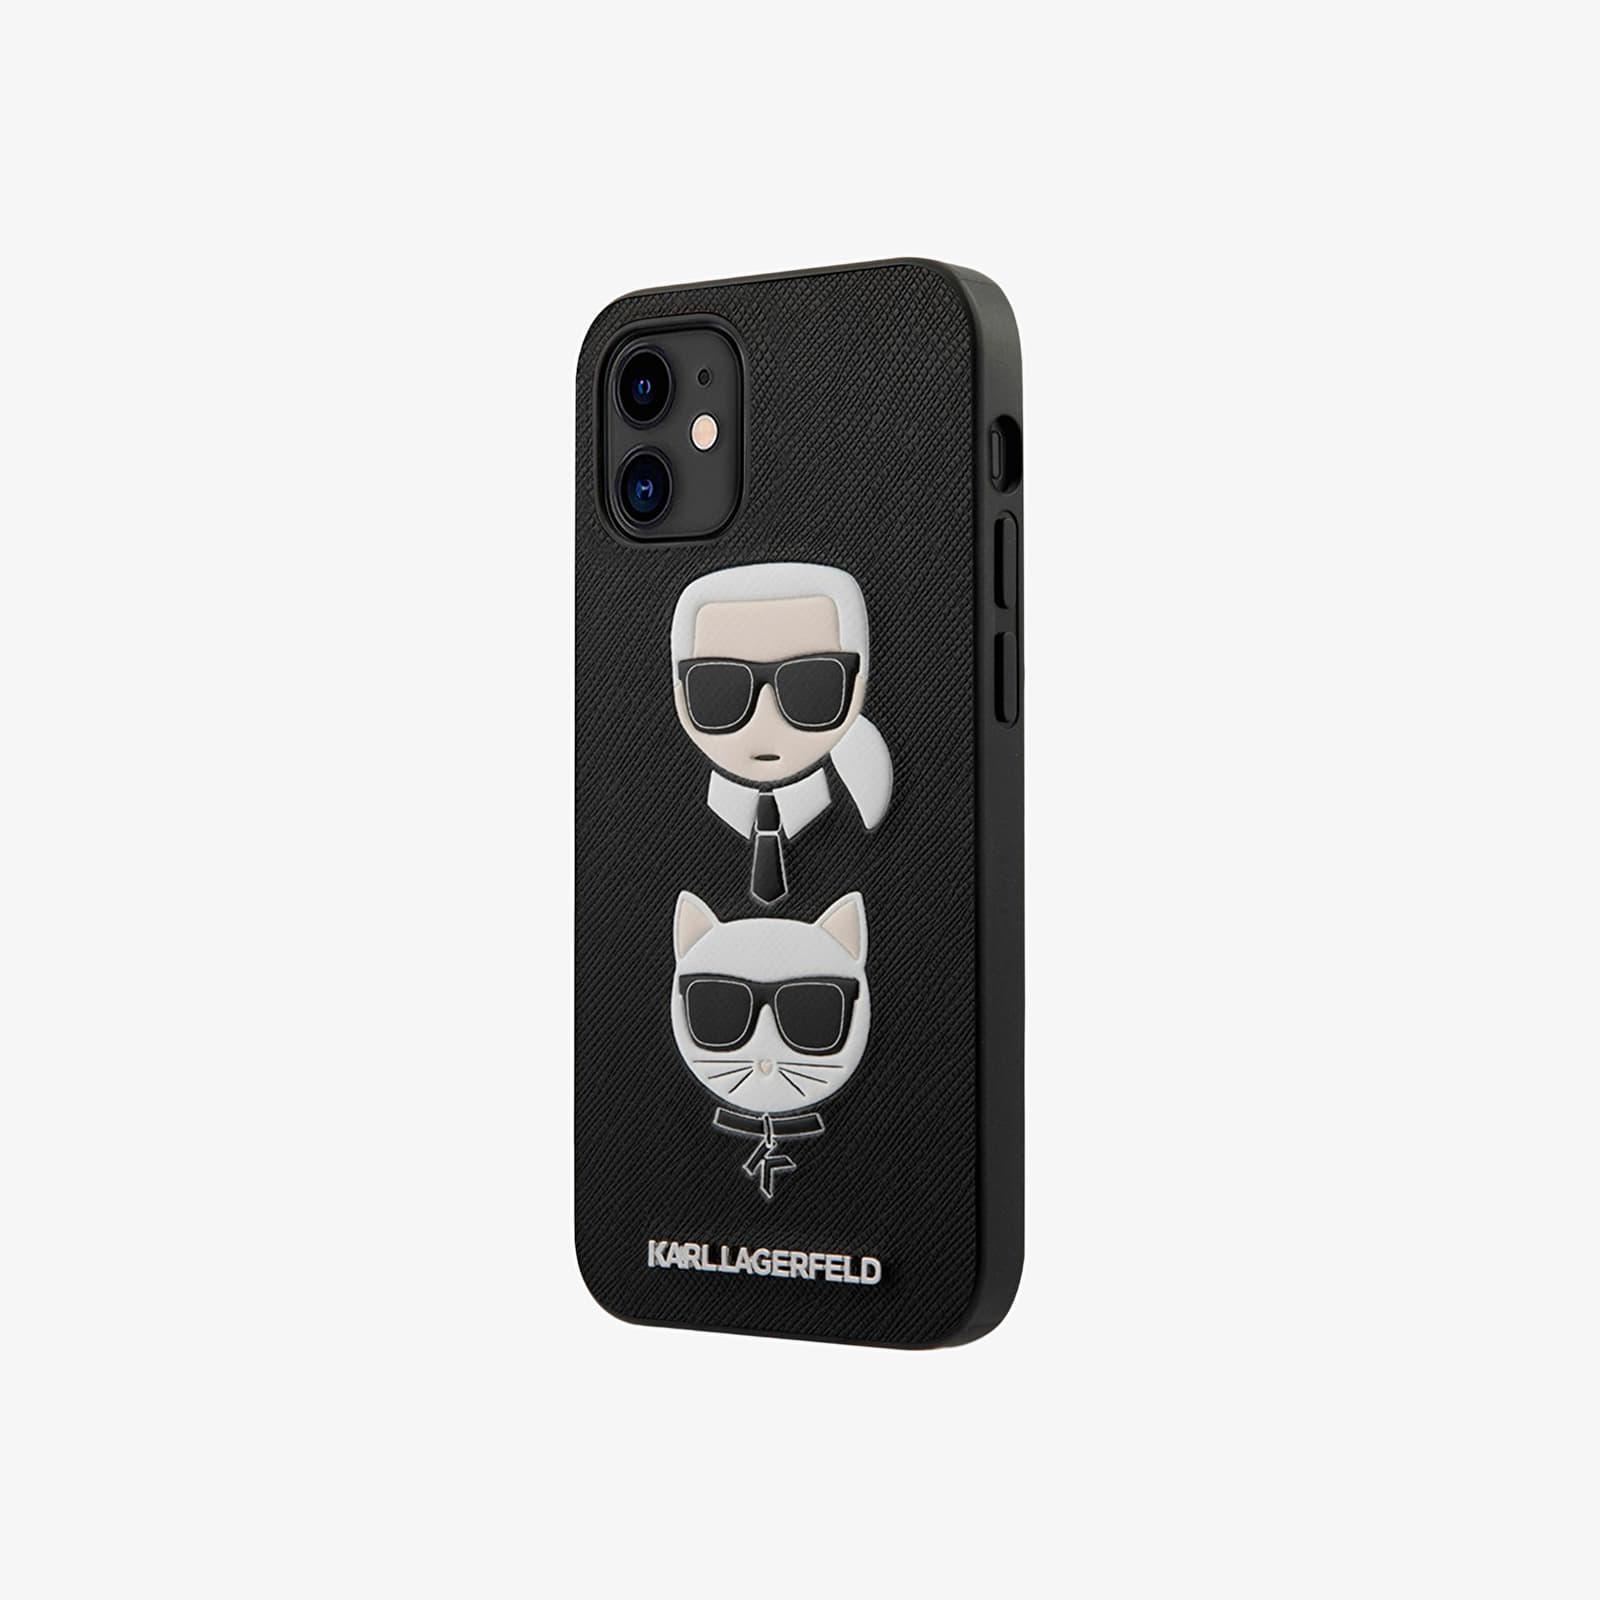 "Karl Lagerfeld Saffiano K&C Heads Cover iPhone 12 mini 5.4"" Black Universal"